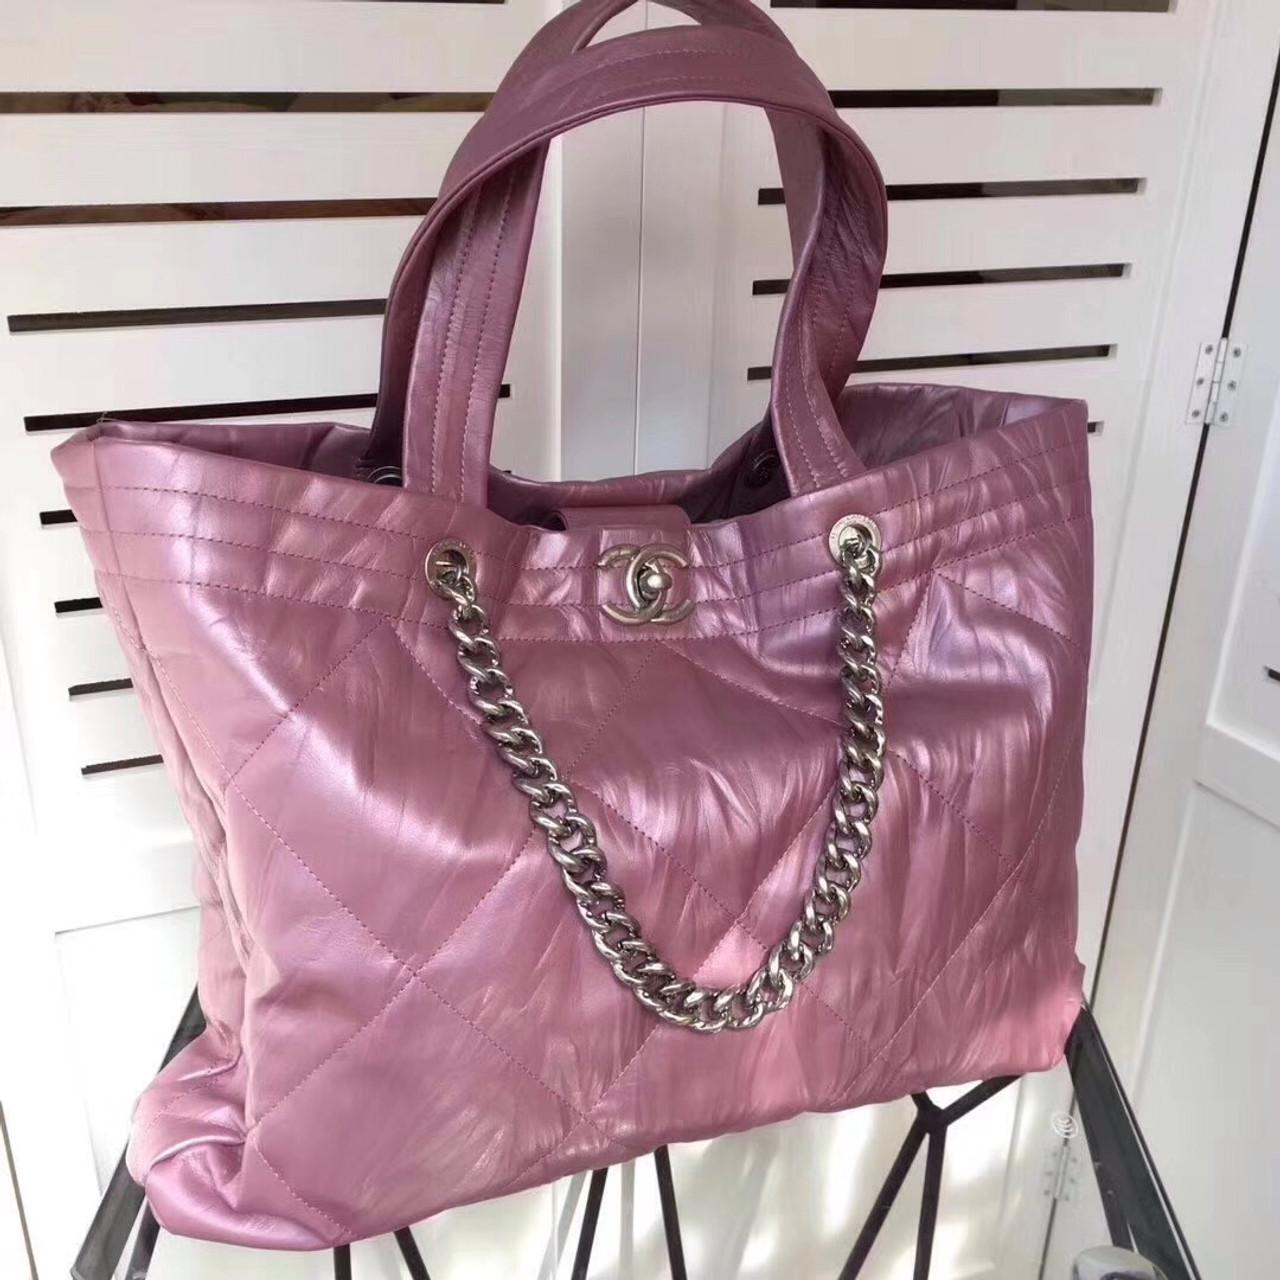 1cb9b30445d7 Chanel Hobo Handbag Pink F/W 2017 - Bella Vita Moda